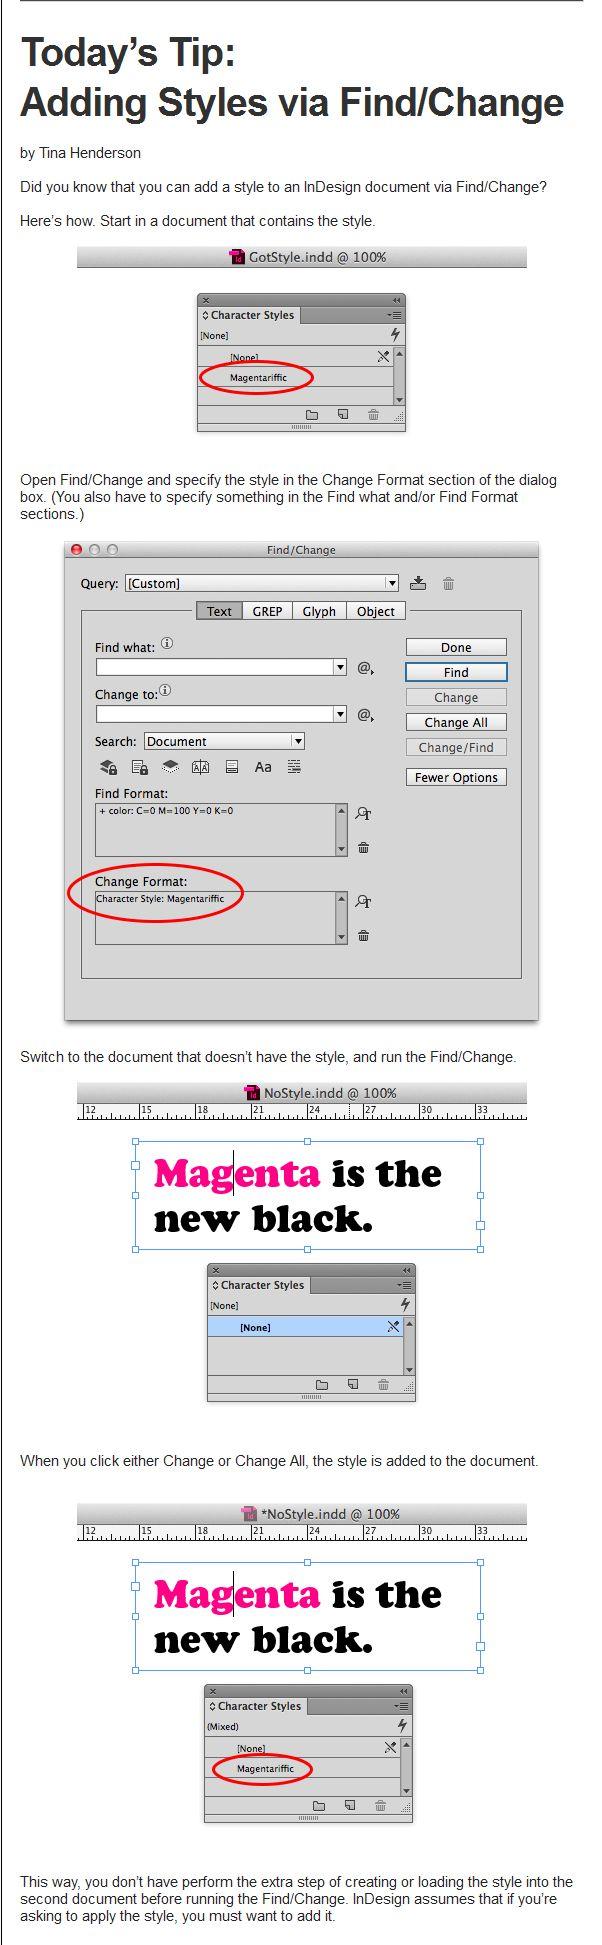 101 mejores imágenes de InDesign Stuff en Pinterest | Adobe indesign ...